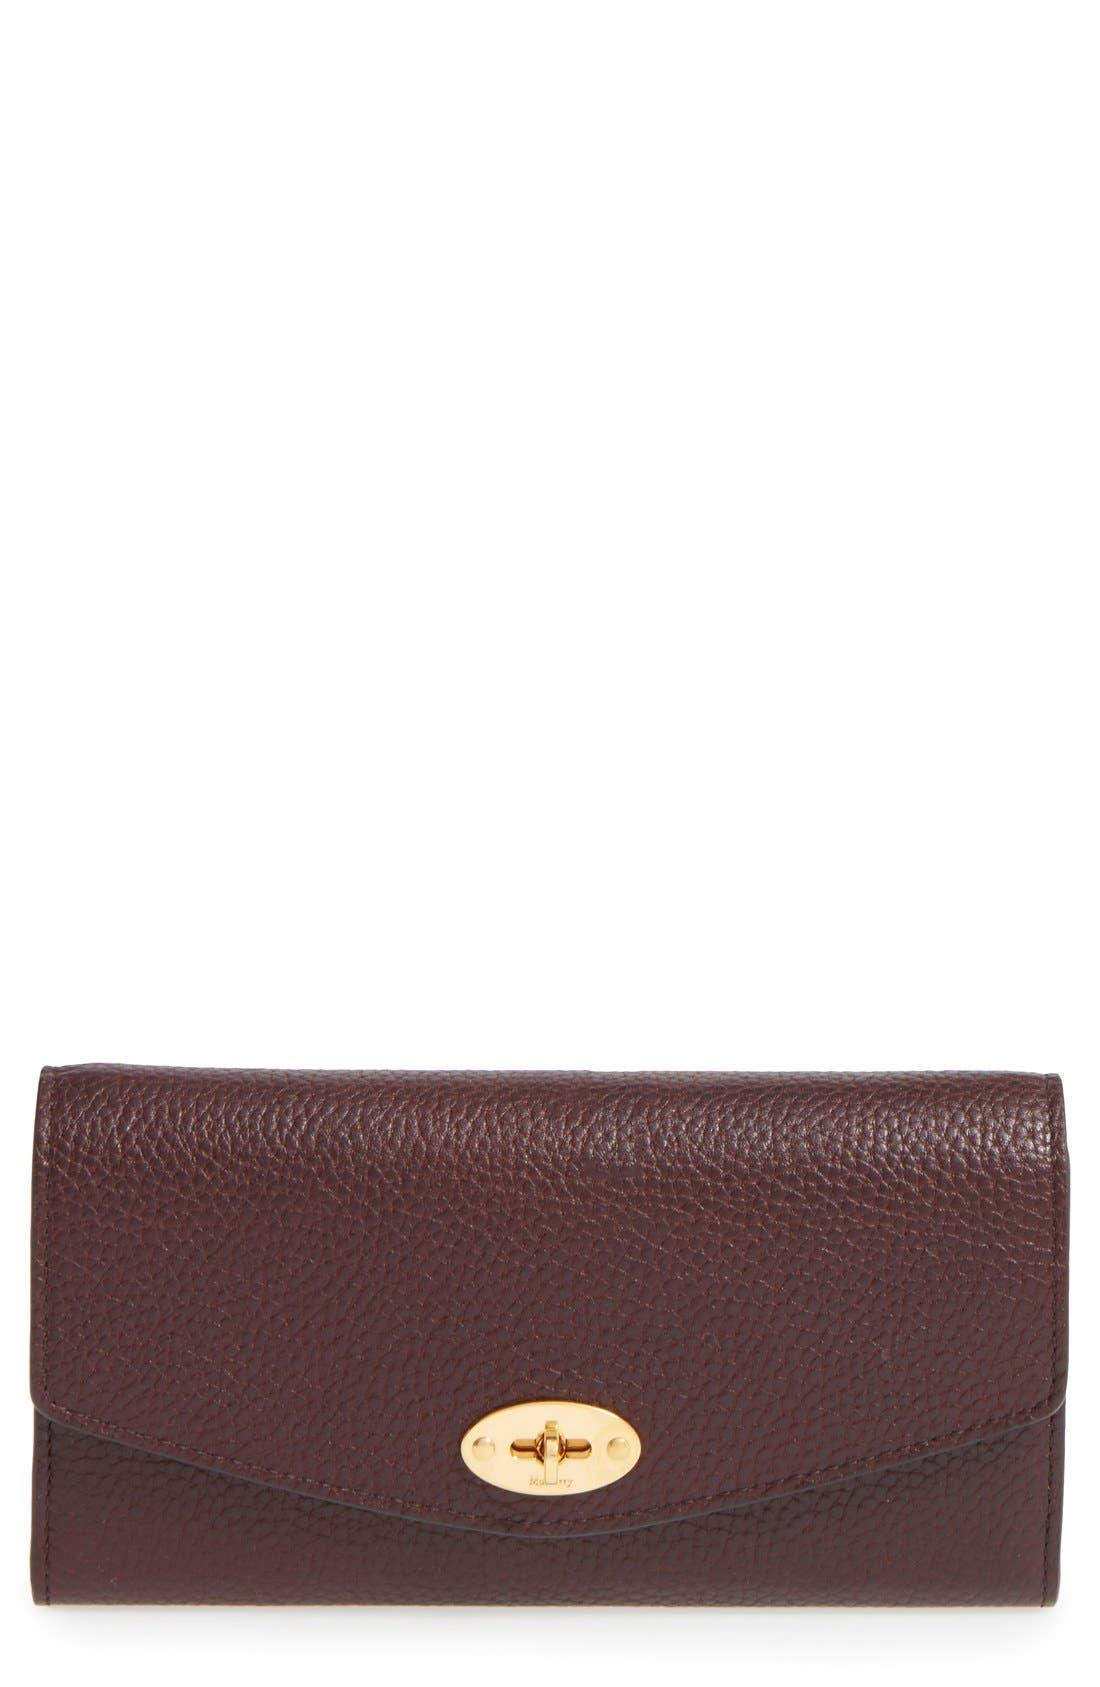 'Postman's Lock' Leather Wallet,                         Main,                         color, Oxblood